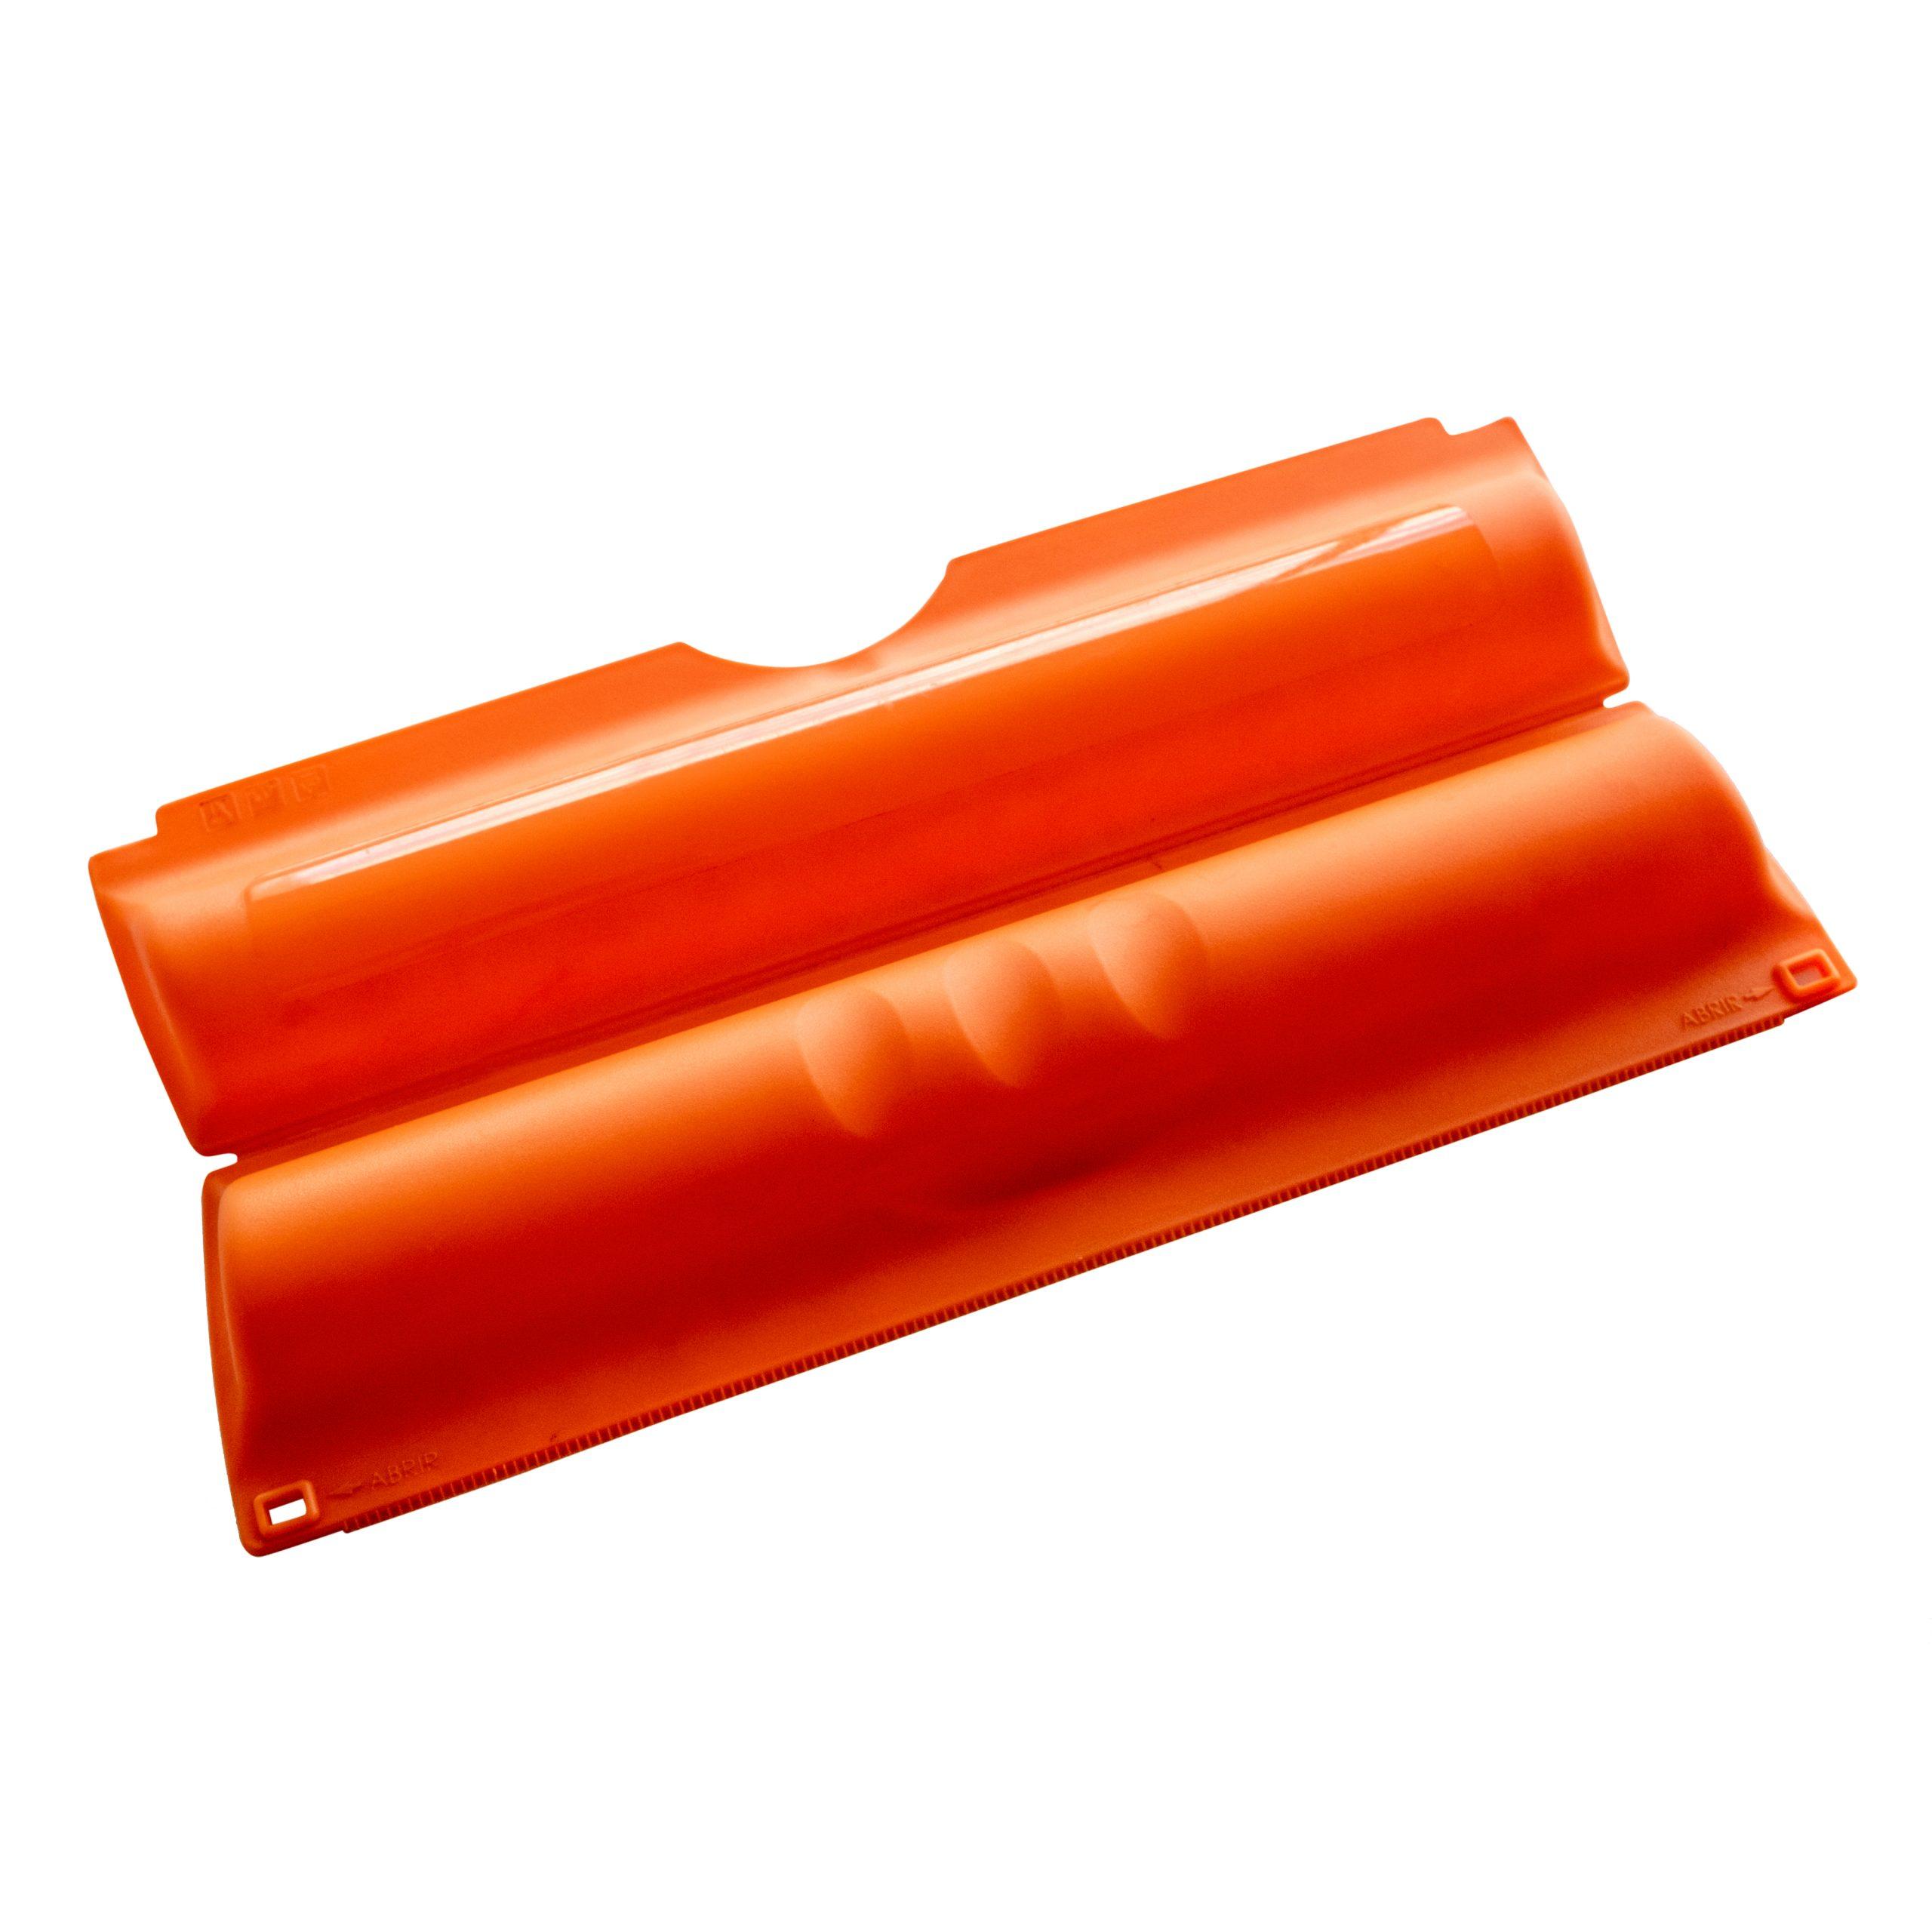 inovamolde-moldes-tecnicos-alimentar-3